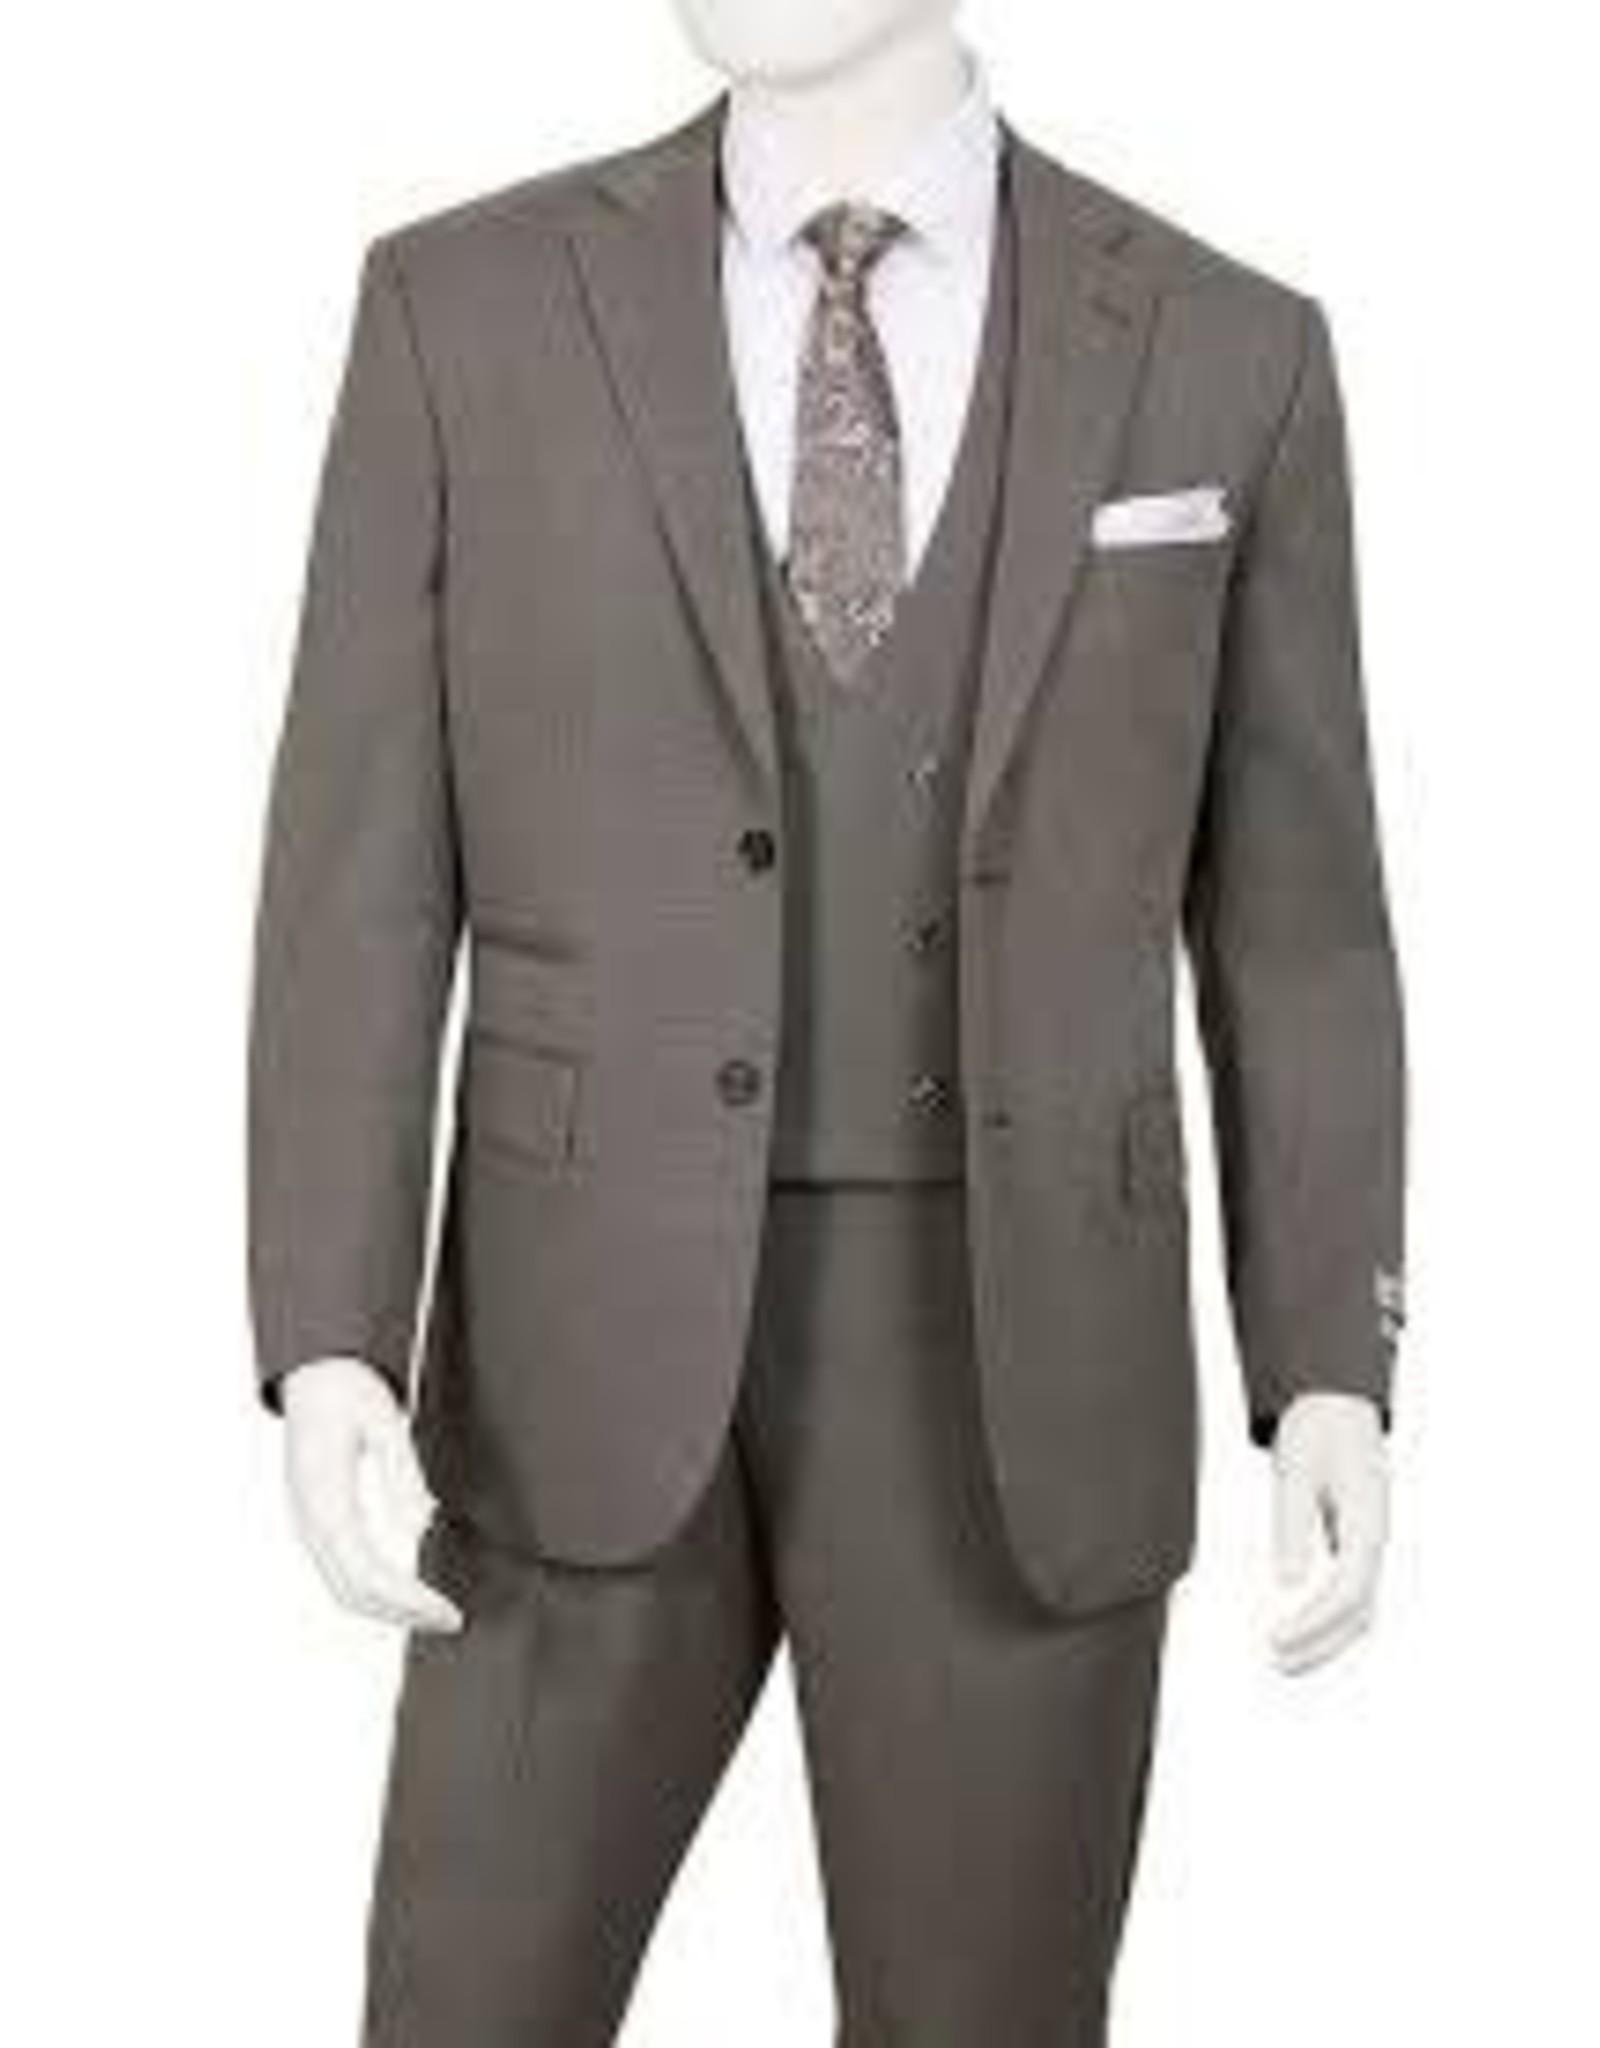 Lorenzo Bruno Lorenzo Bruno Vested Suit - T62BR Oxford